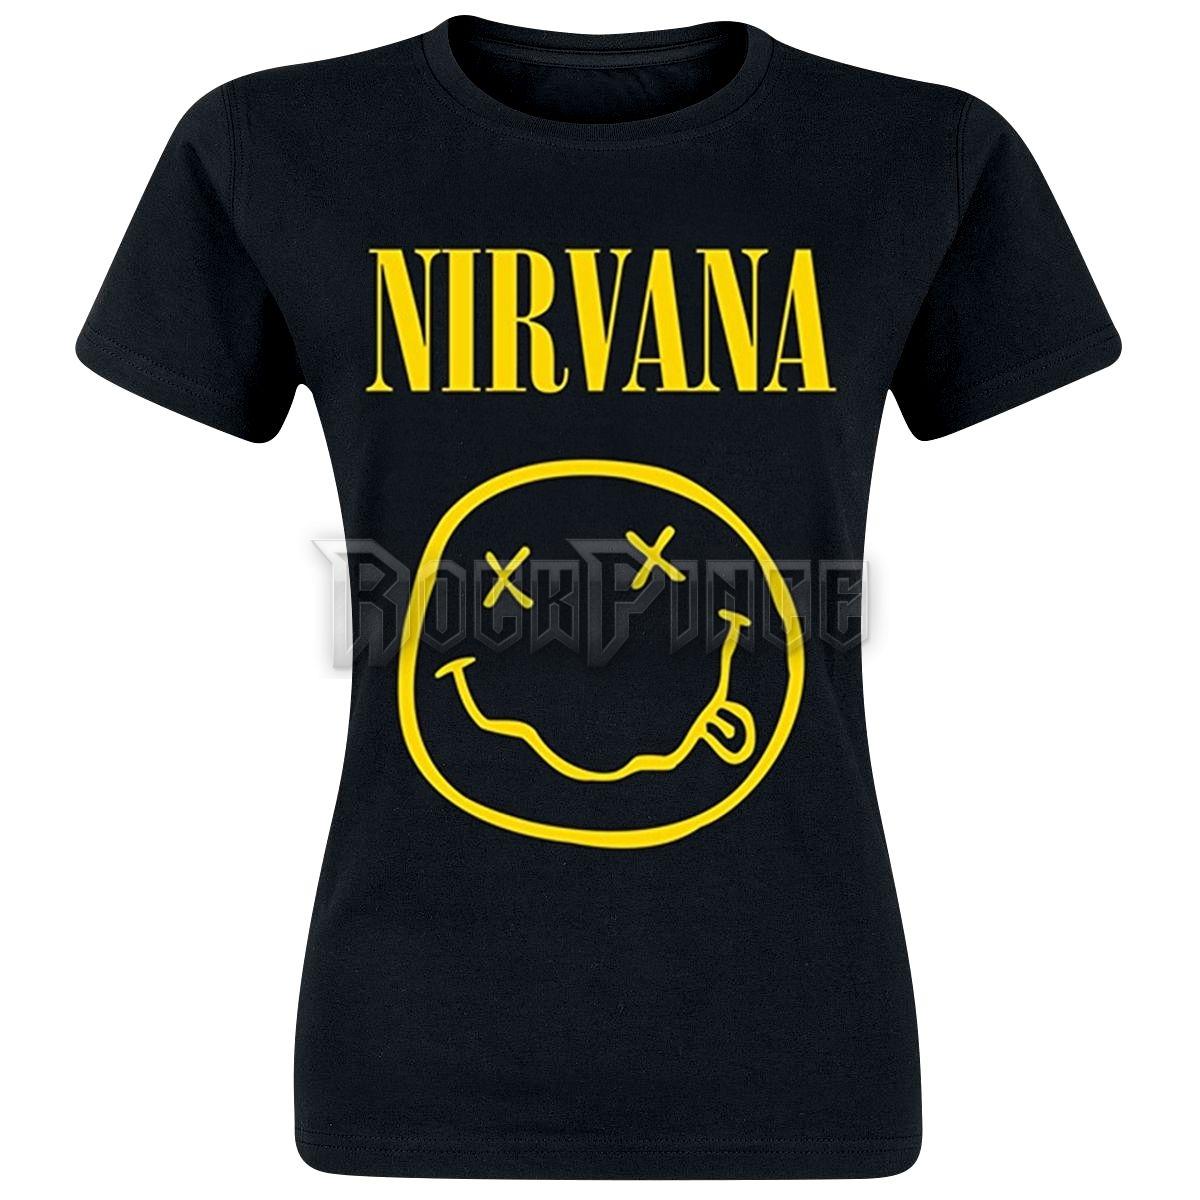 58dc2f6e59 NIRVANA - SMILEY - női póló - Rockpince